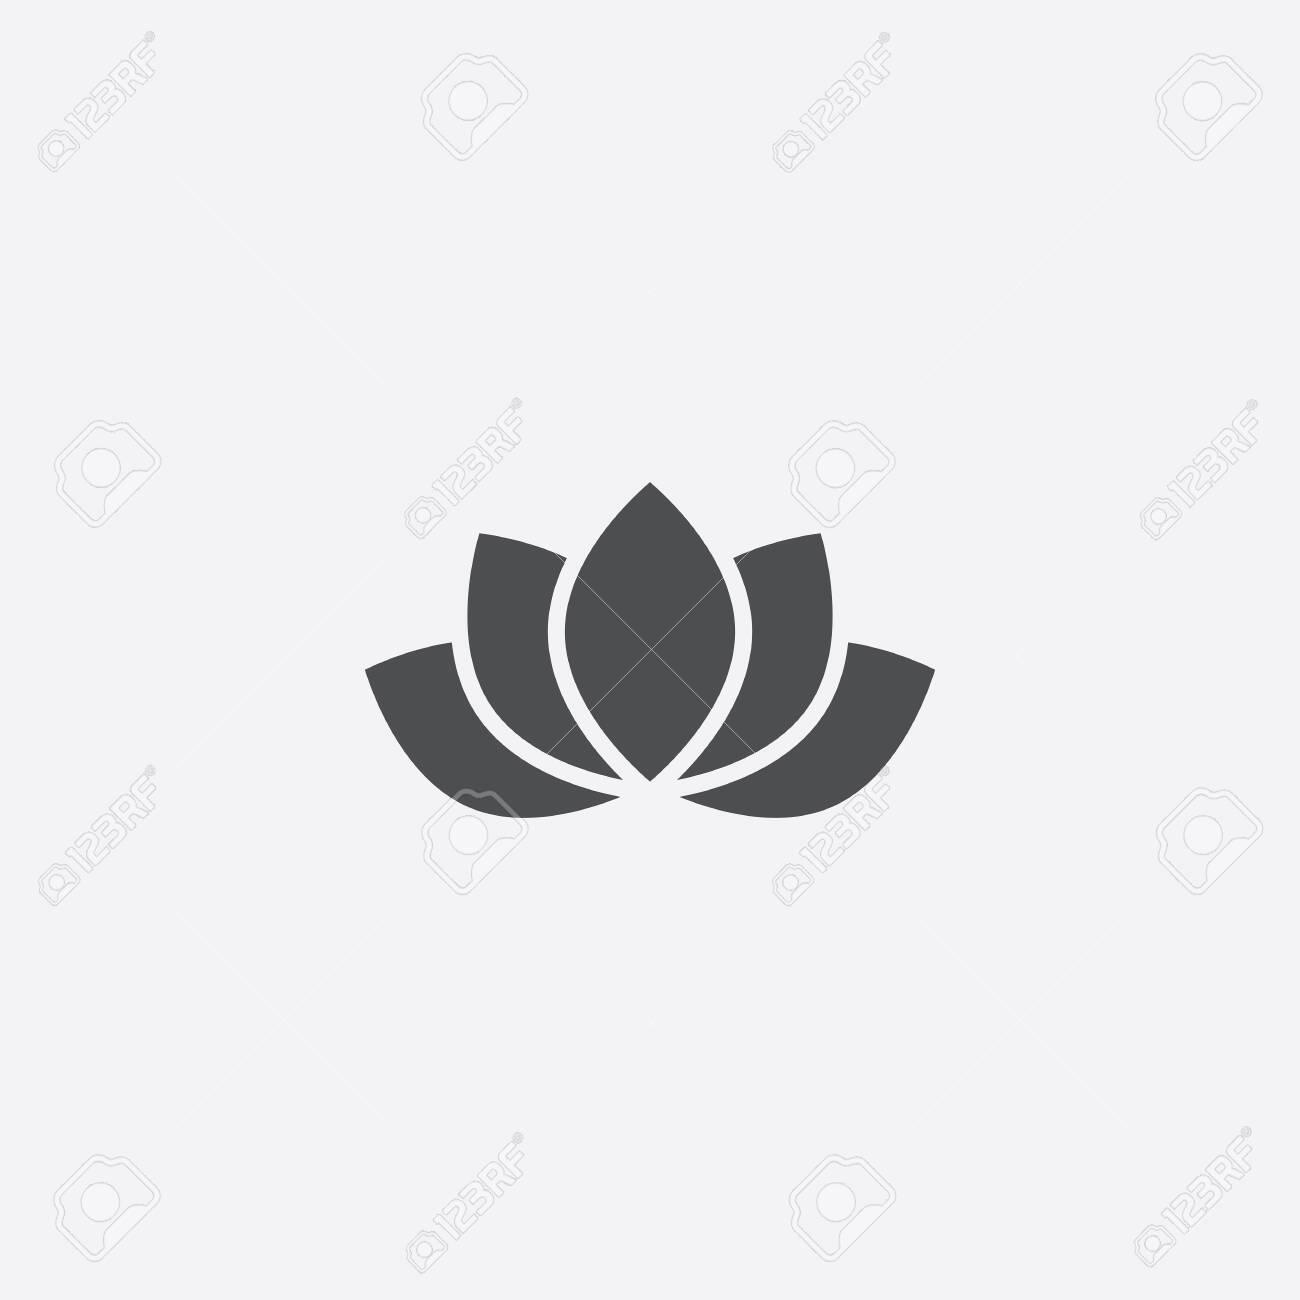 flower icon - 143060004